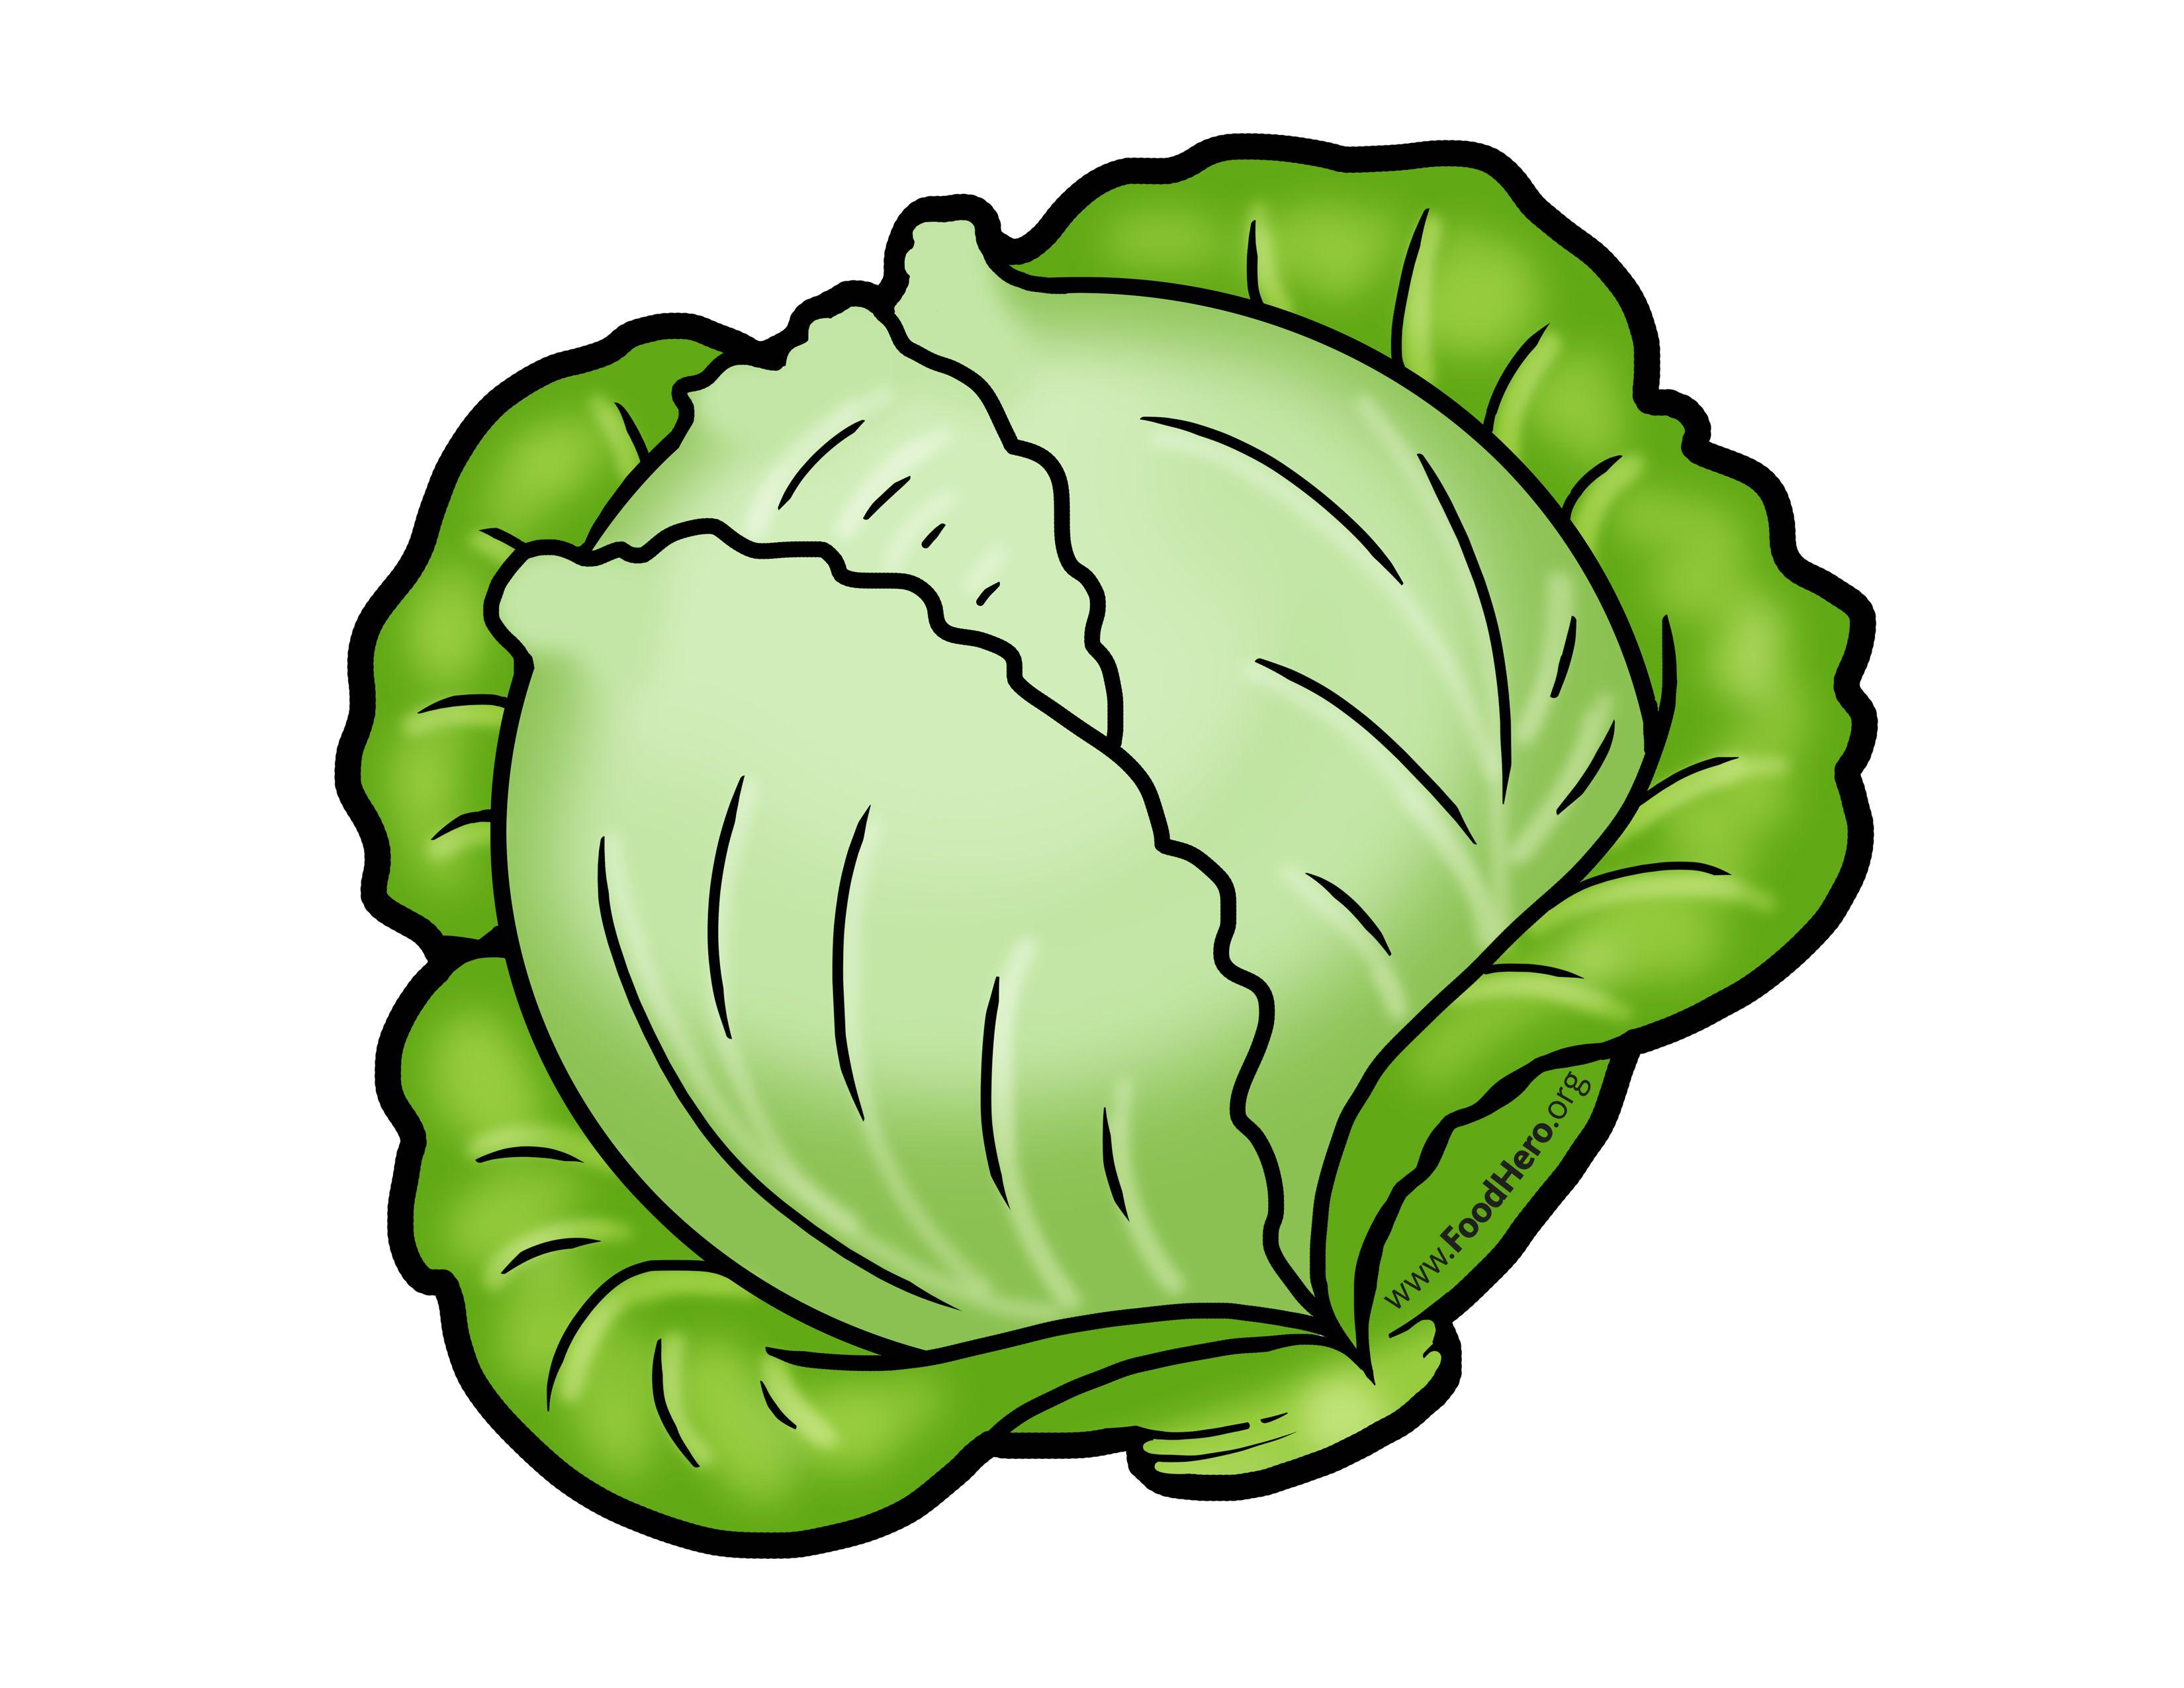 Cabbage illustration. Foodhero.org. #bullentinboards #schoolart.